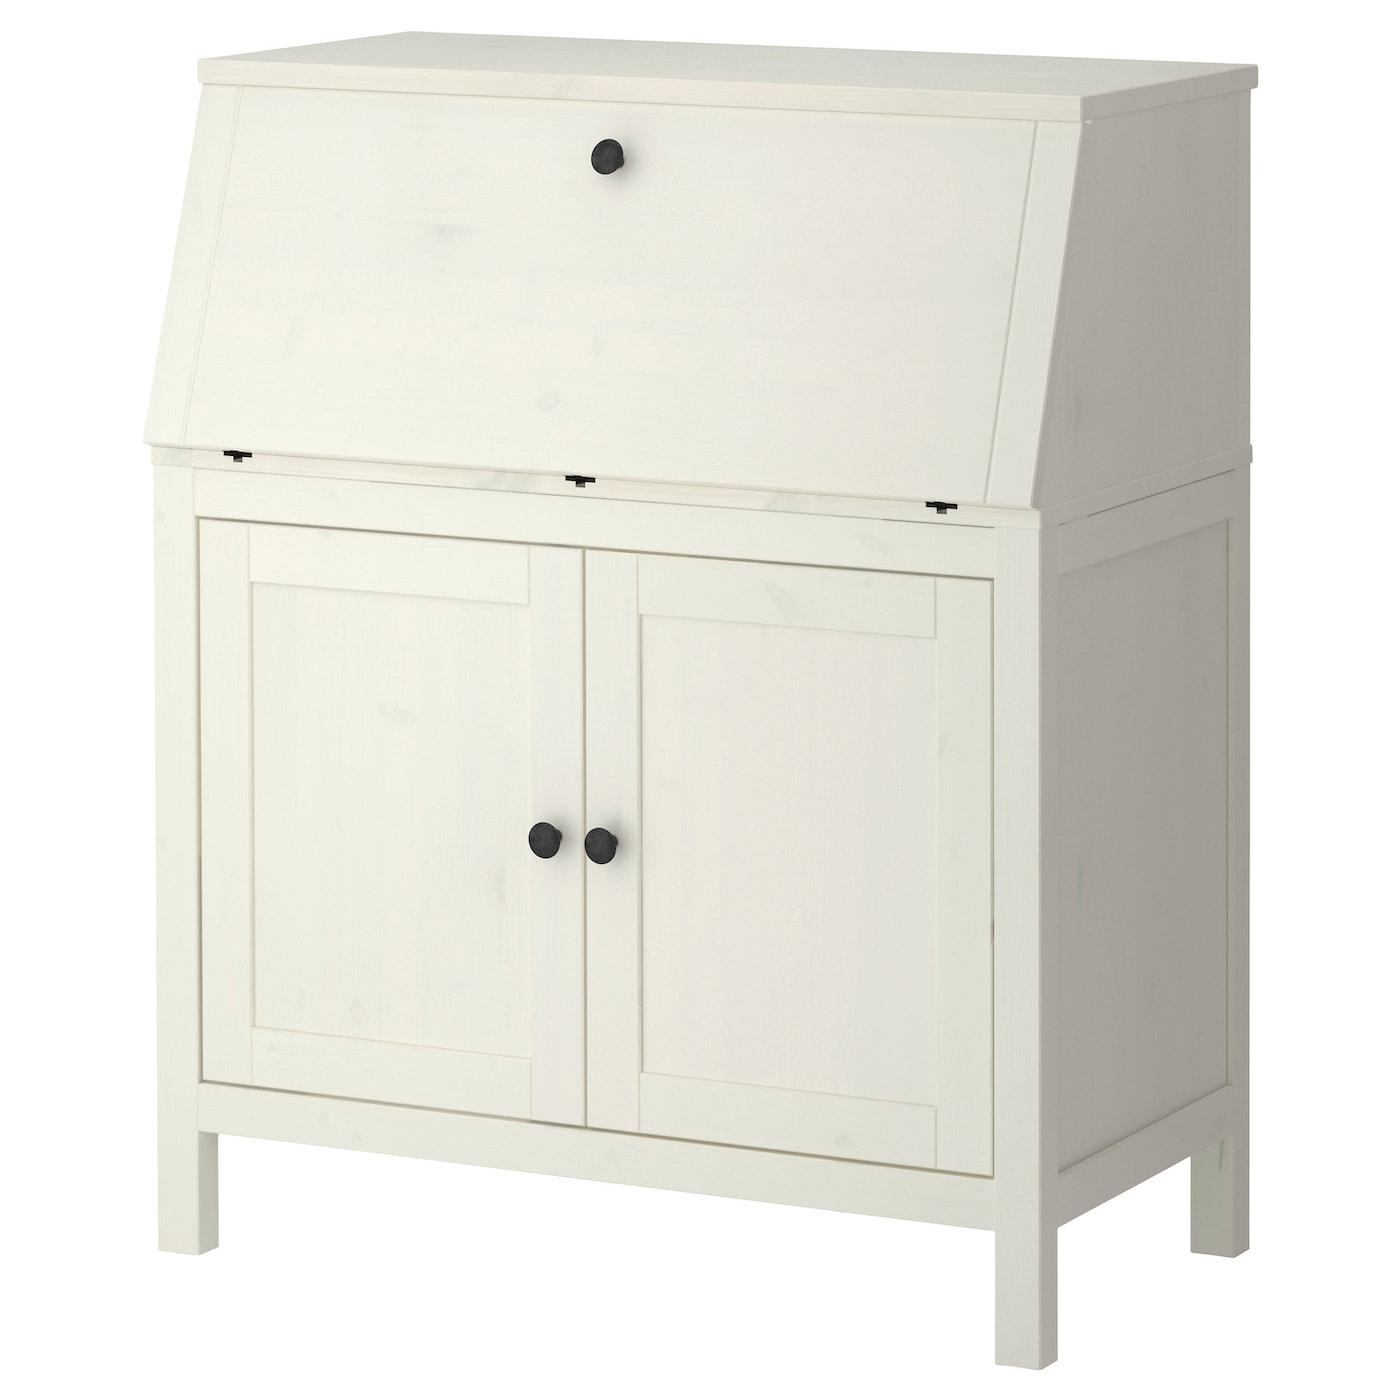 Hemnes Bureau White Stain 89 X 108 Cm Ikea